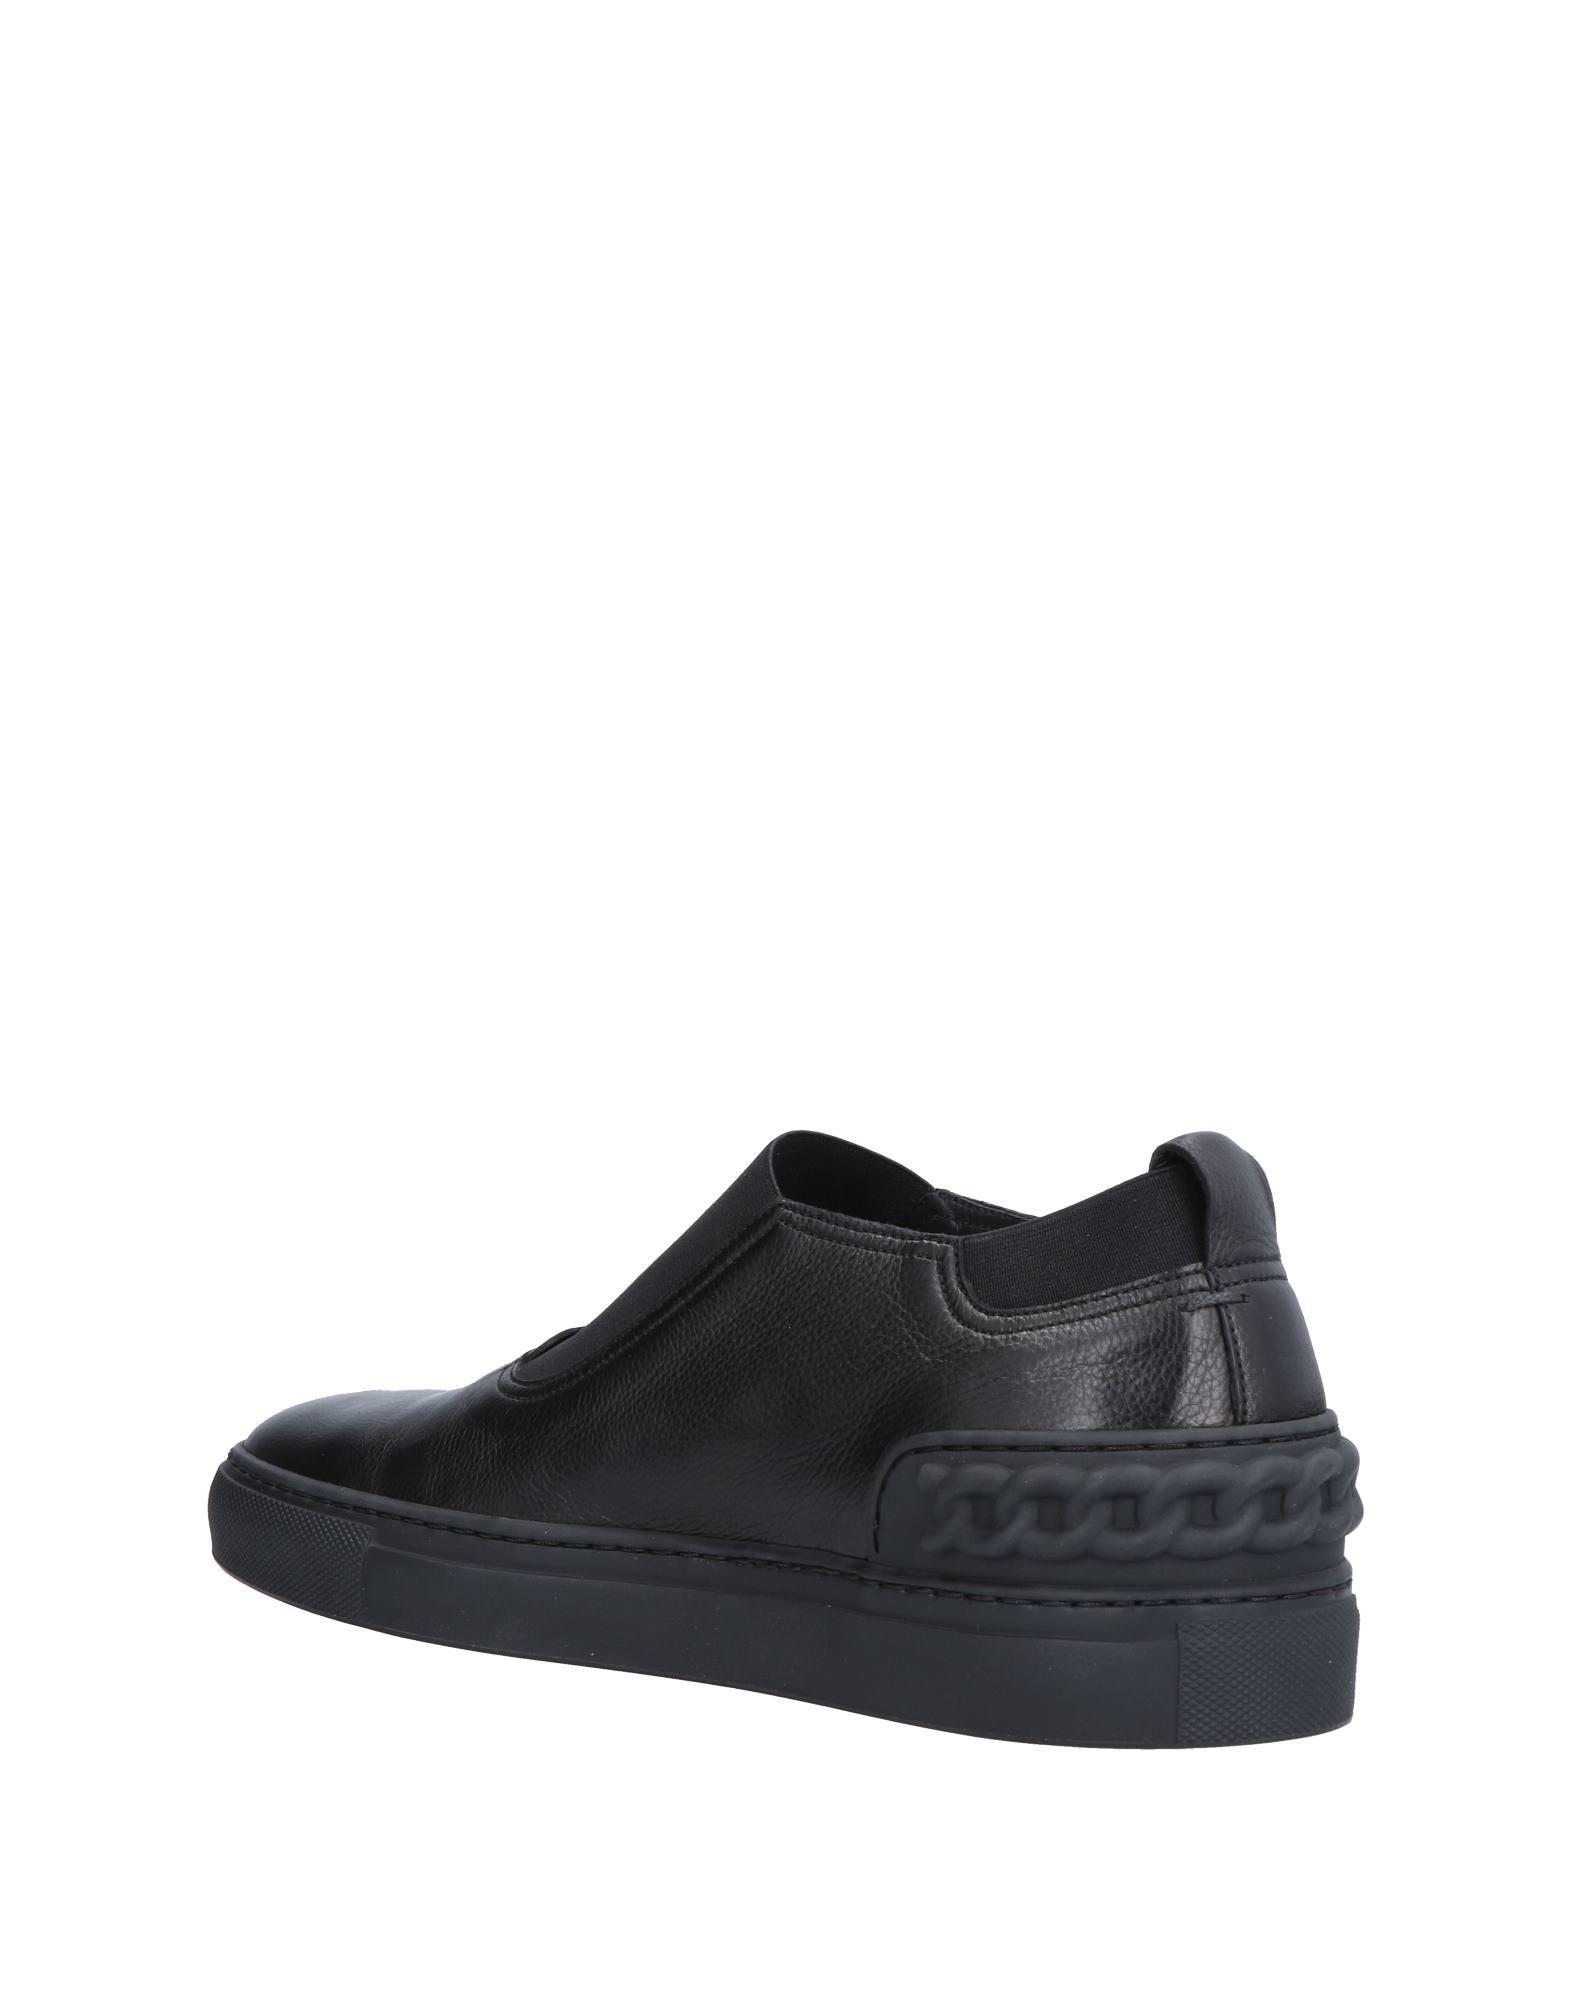 Cesare 11500416VR Casadei Sneakers Herren  11500416VR Cesare Gute Qualität beliebte Schuhe fcbada